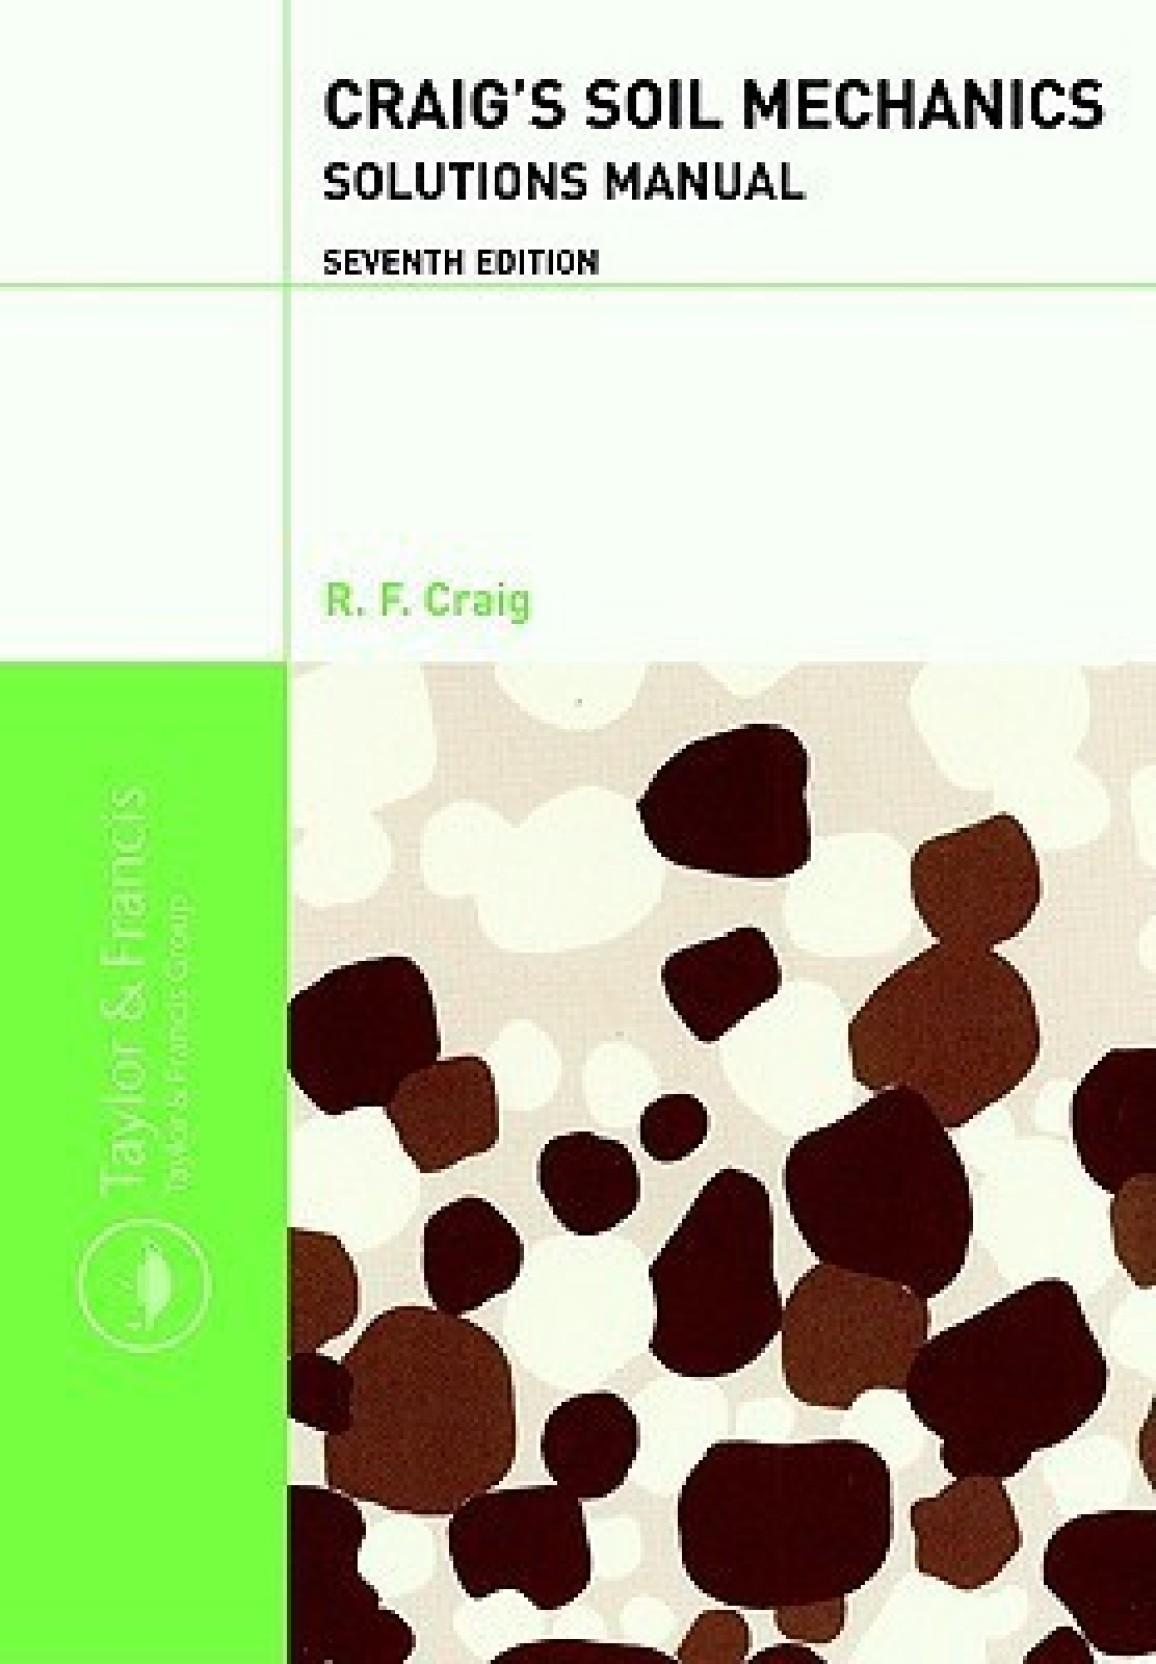 Craig's Soil Mechanics: Solutions Manual 0007 Edition. ADD TO CART